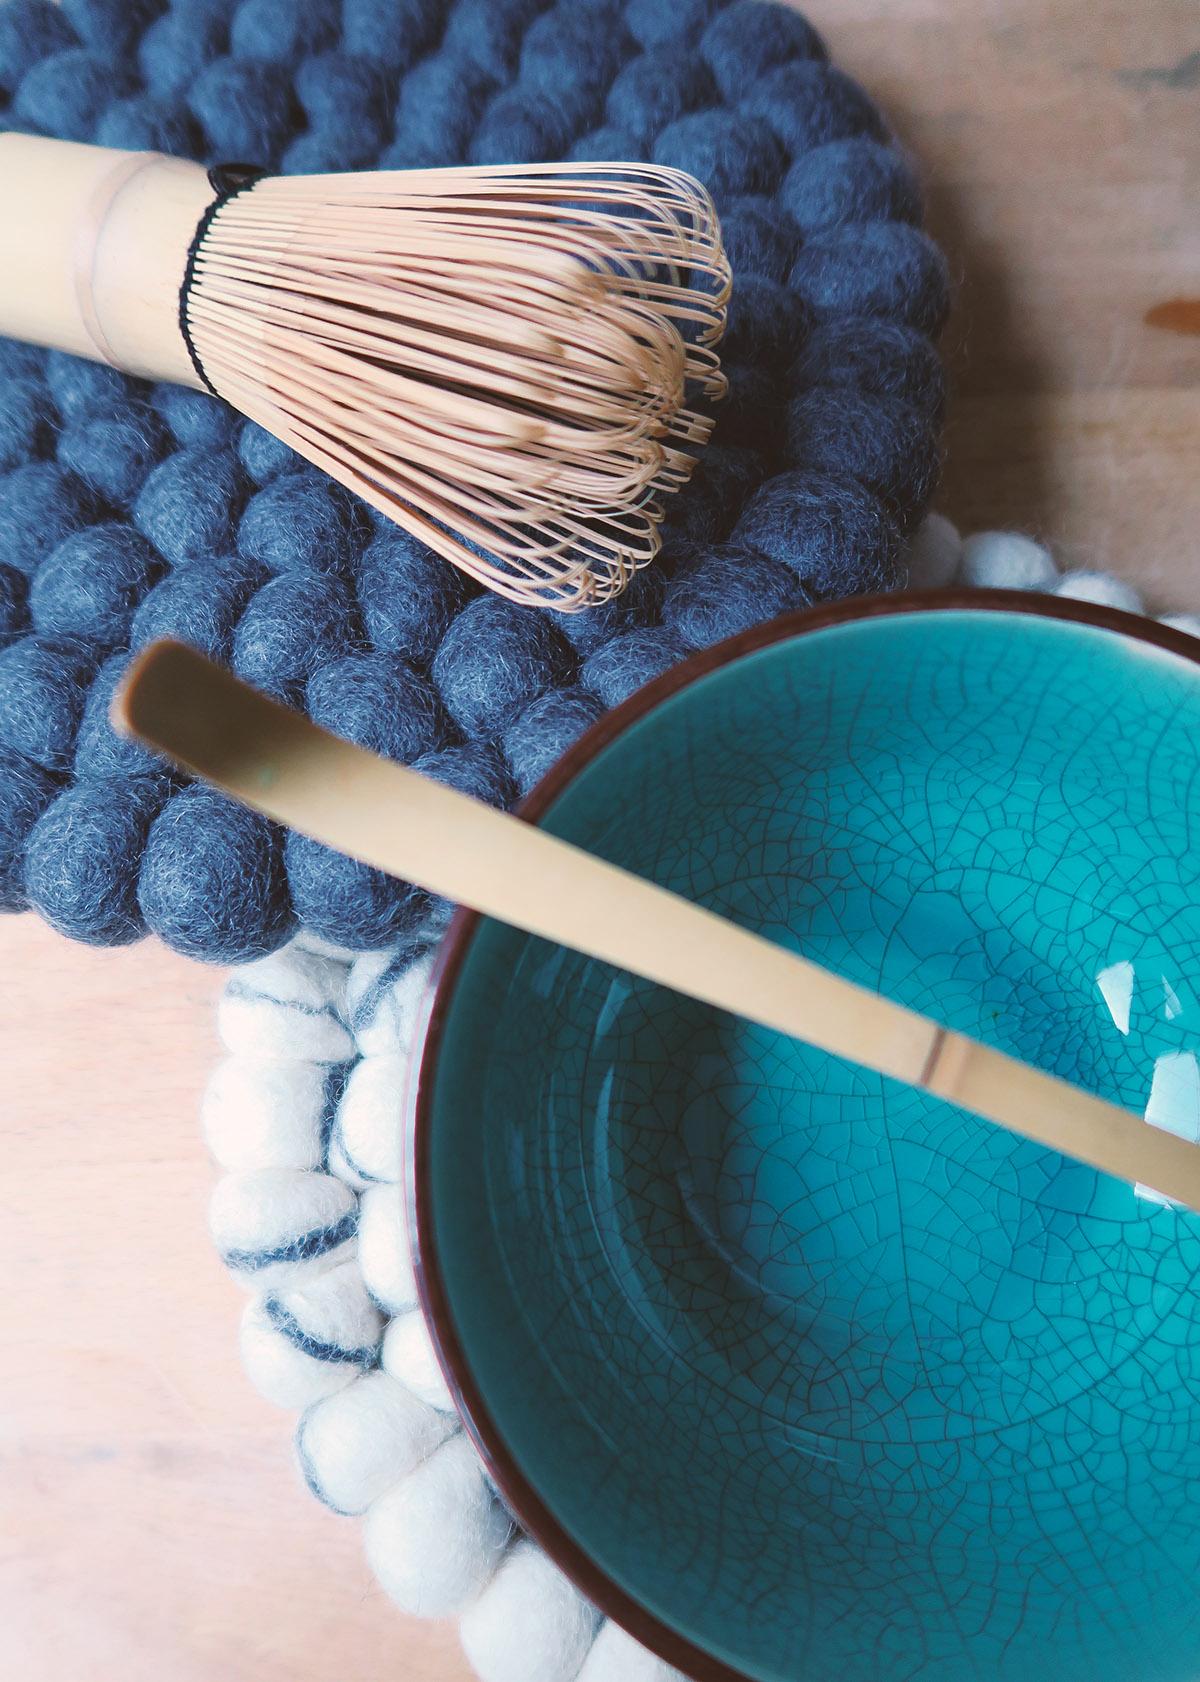 erfahrung test mit matcha tee set besen spatel bambus. Black Bedroom Furniture Sets. Home Design Ideas